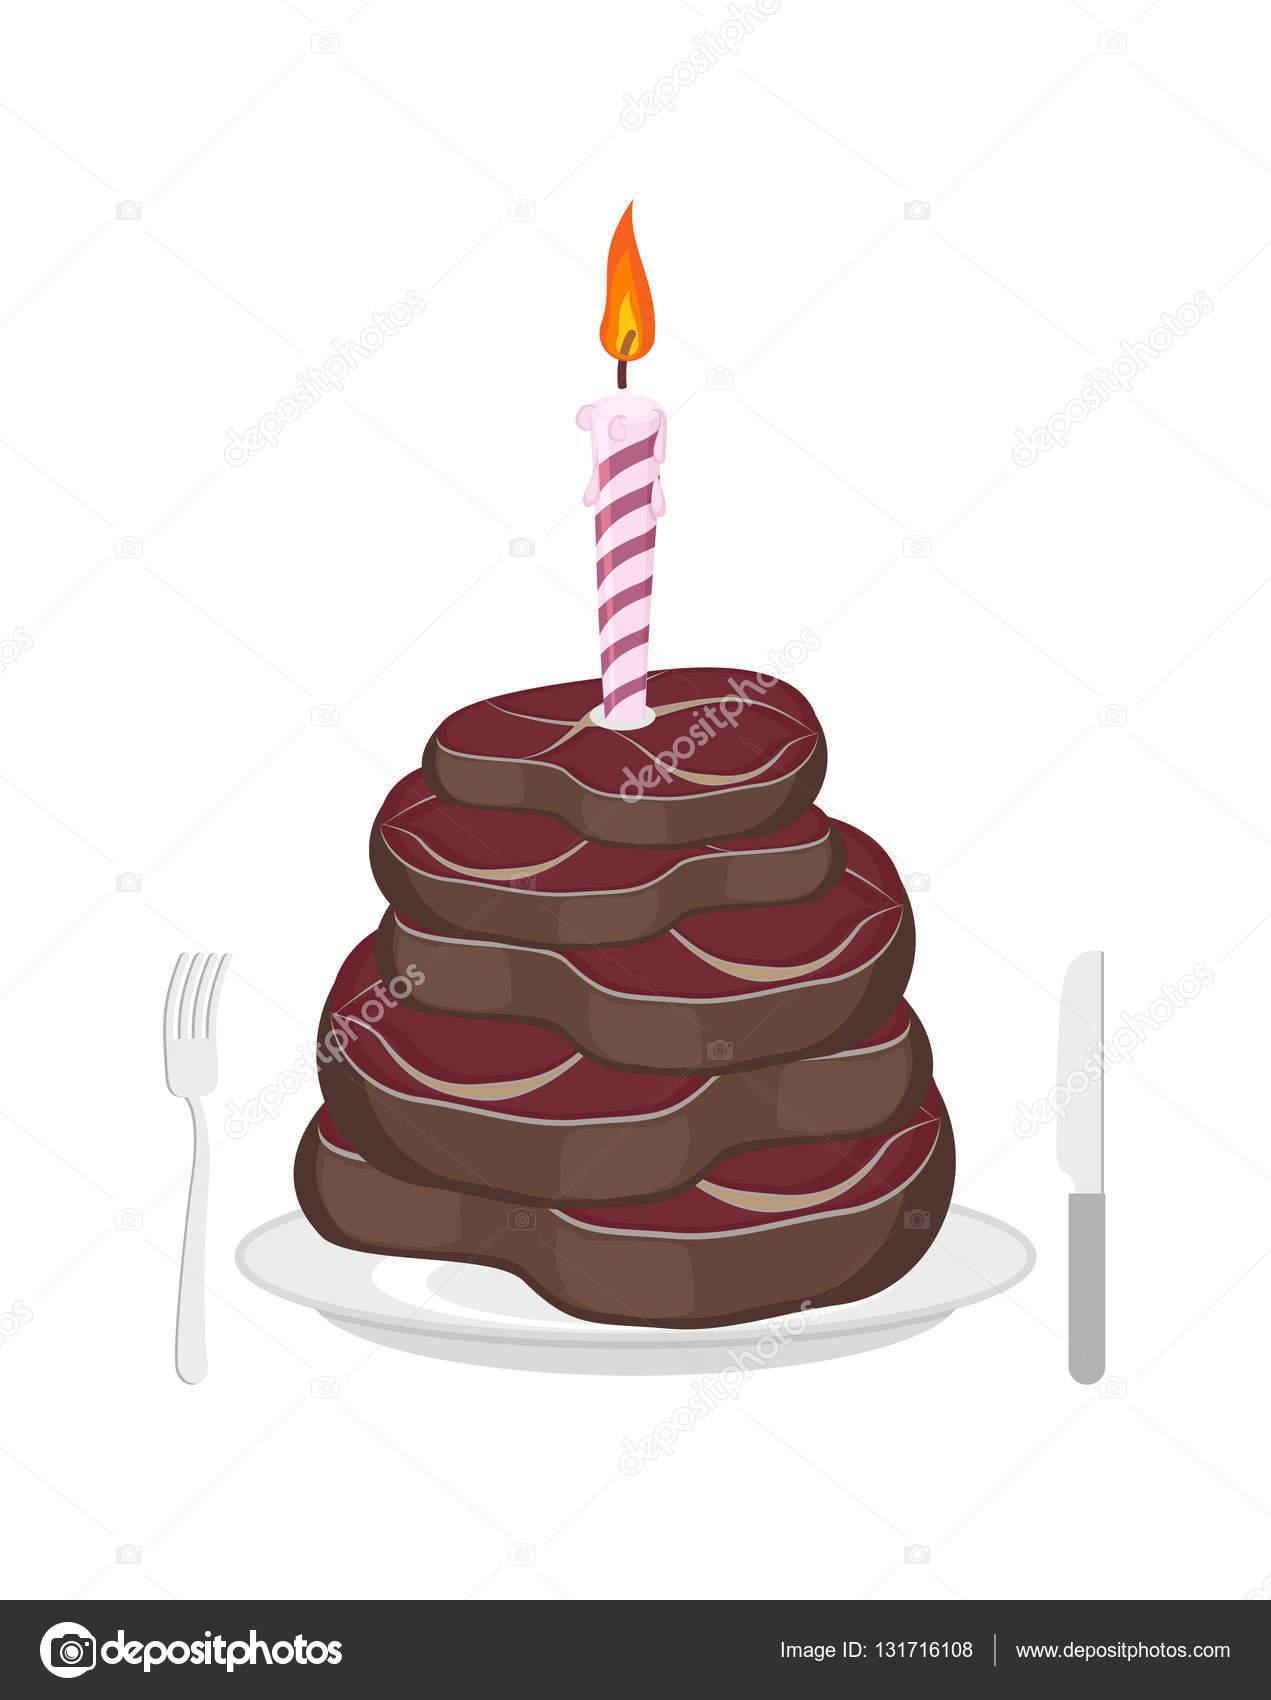 happy birthday cake for men